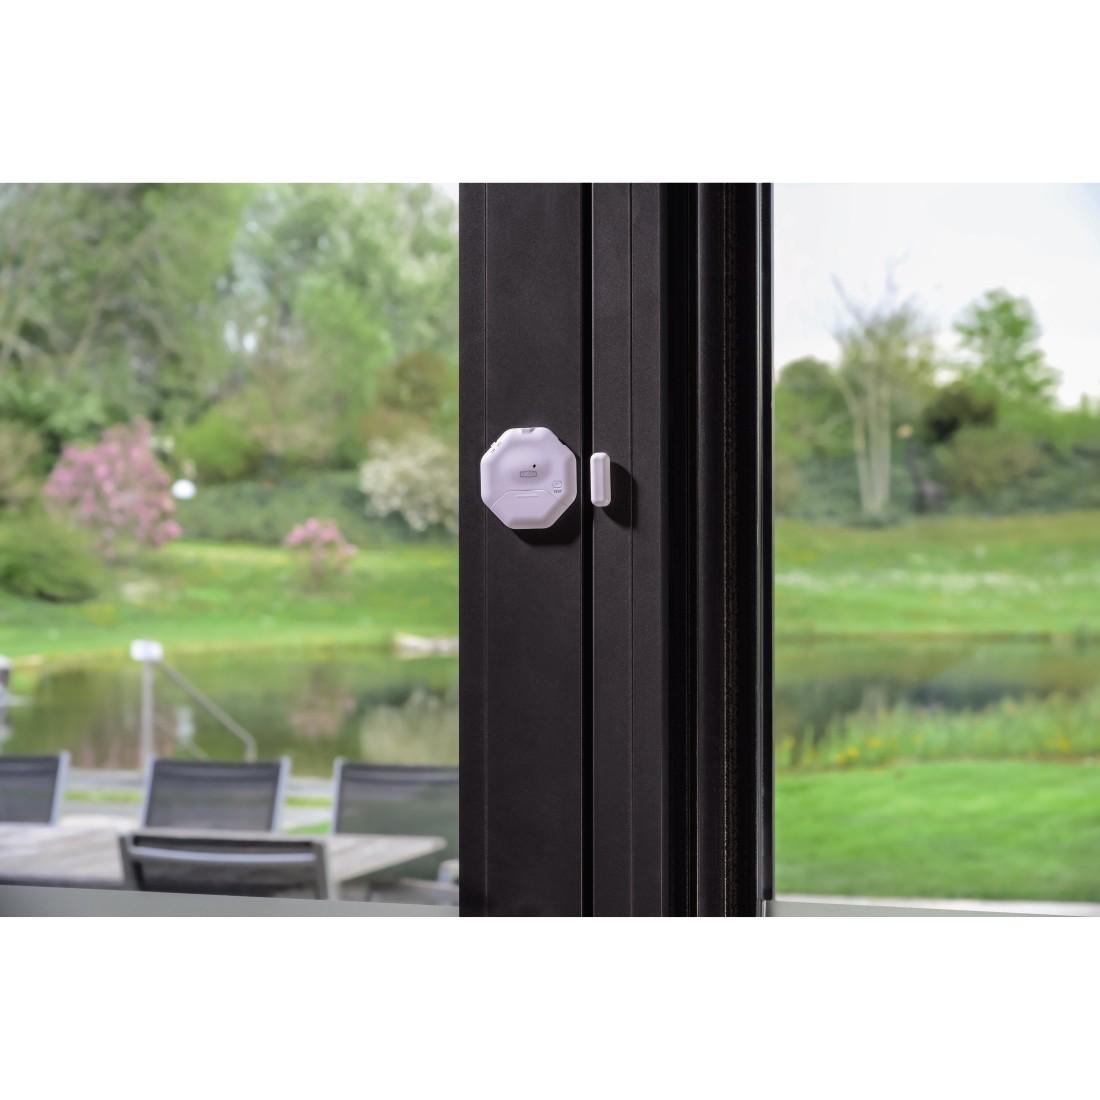 00111985 xavax fenster t r alarm sensor flach. Black Bedroom Furniture Sets. Home Design Ideas